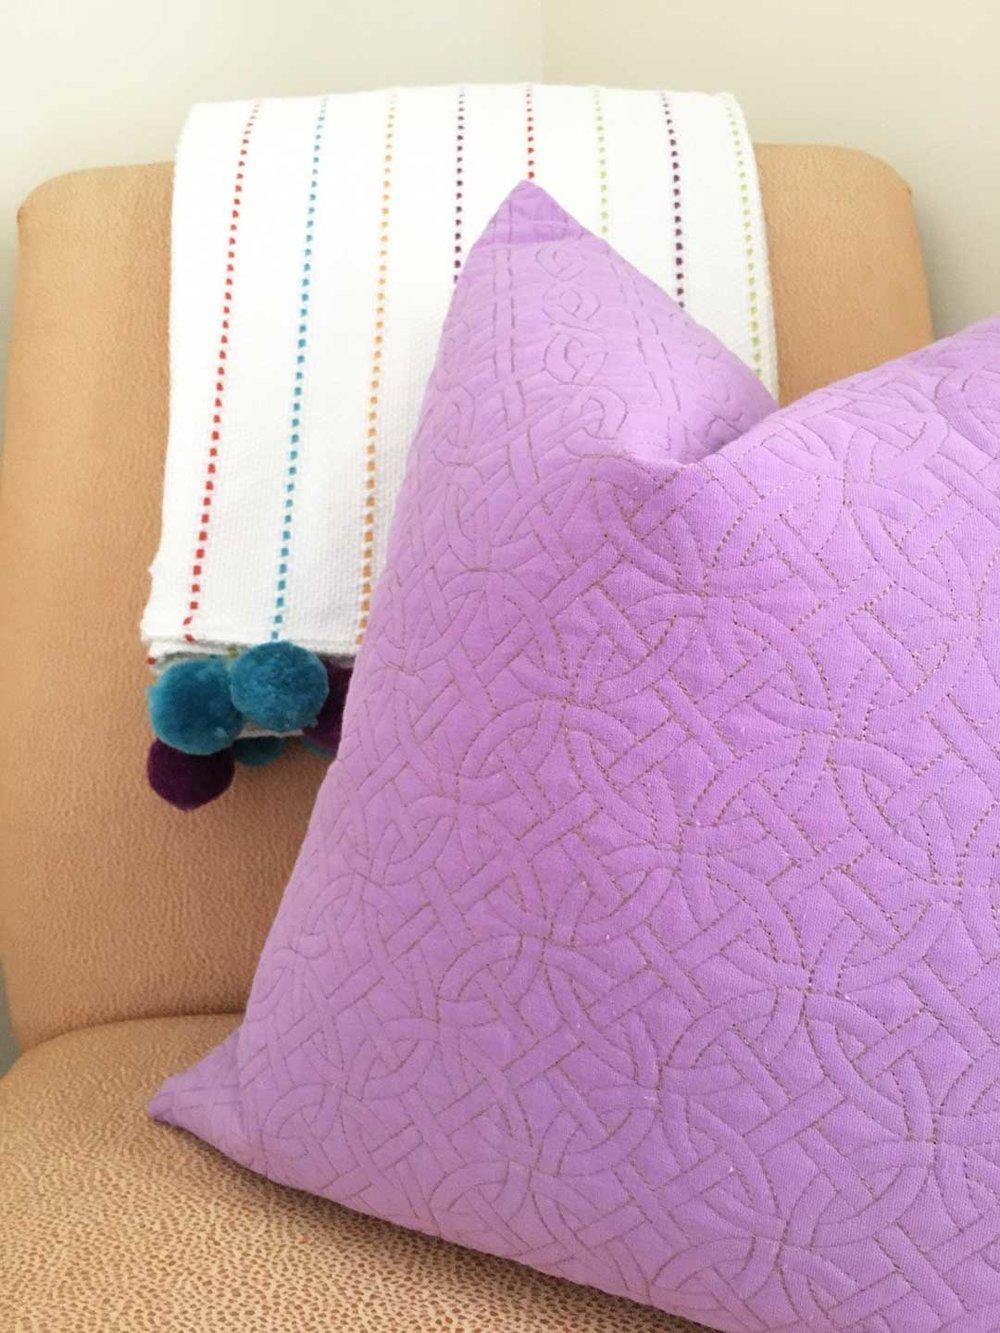 pillow-pom-pom-details-pro.jpg